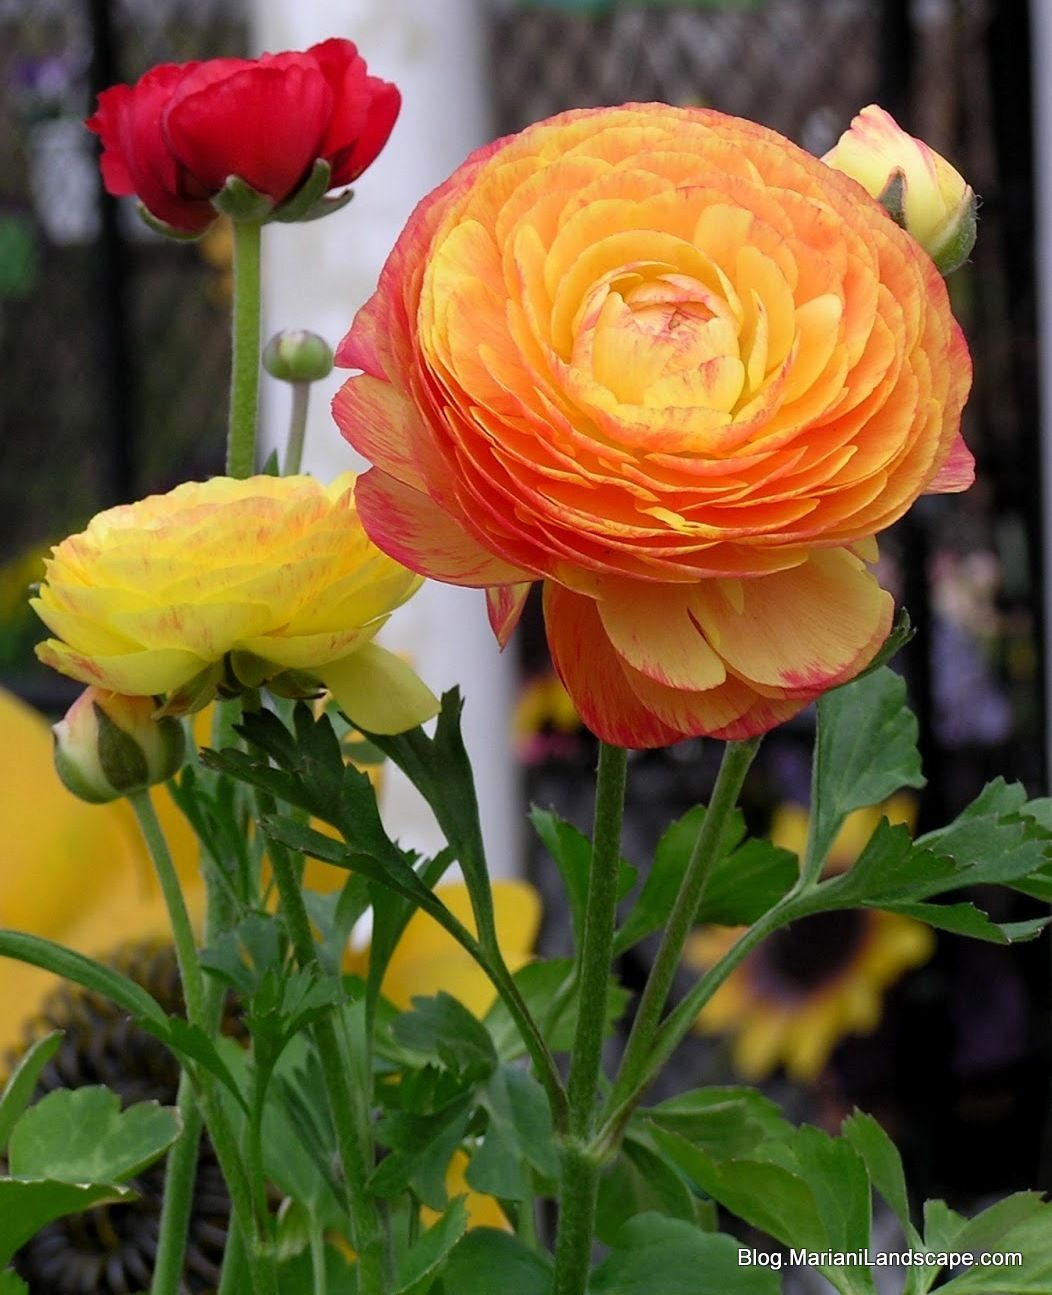 The Extraordinary Persian Buttercup Buttercup Flower Persian Buttercup Flowers